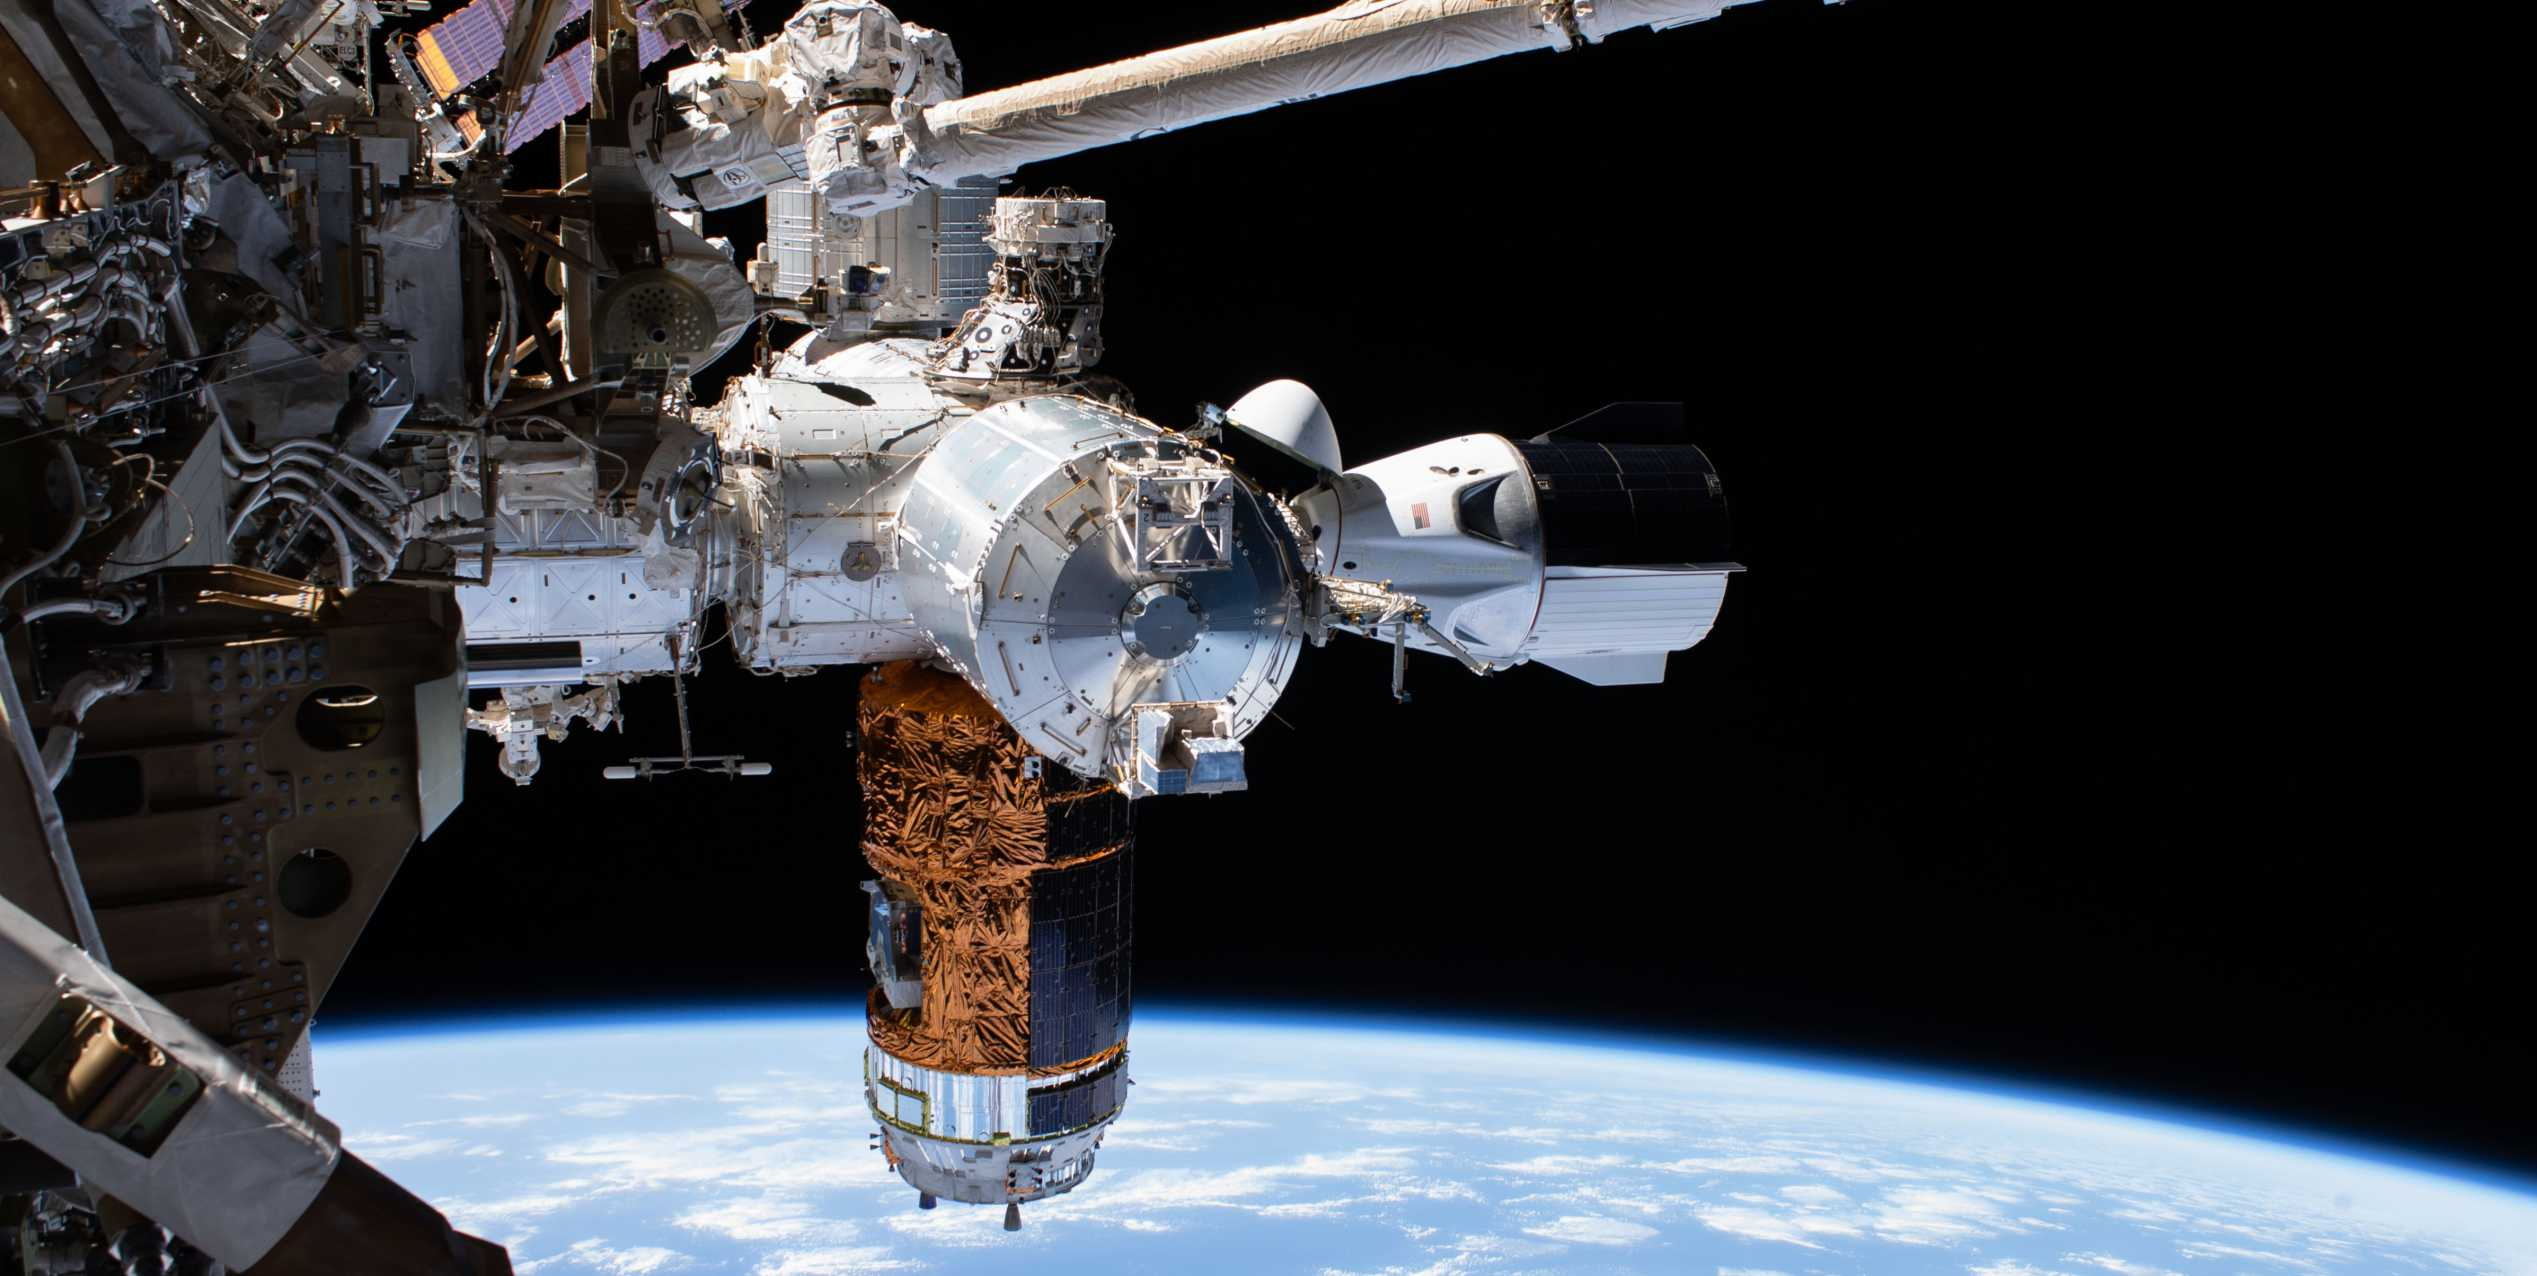 SpaceX Crew Dragon C206 Demo-2 ISS spacewalk 070120 (NASA) 1 crop 1 (c)